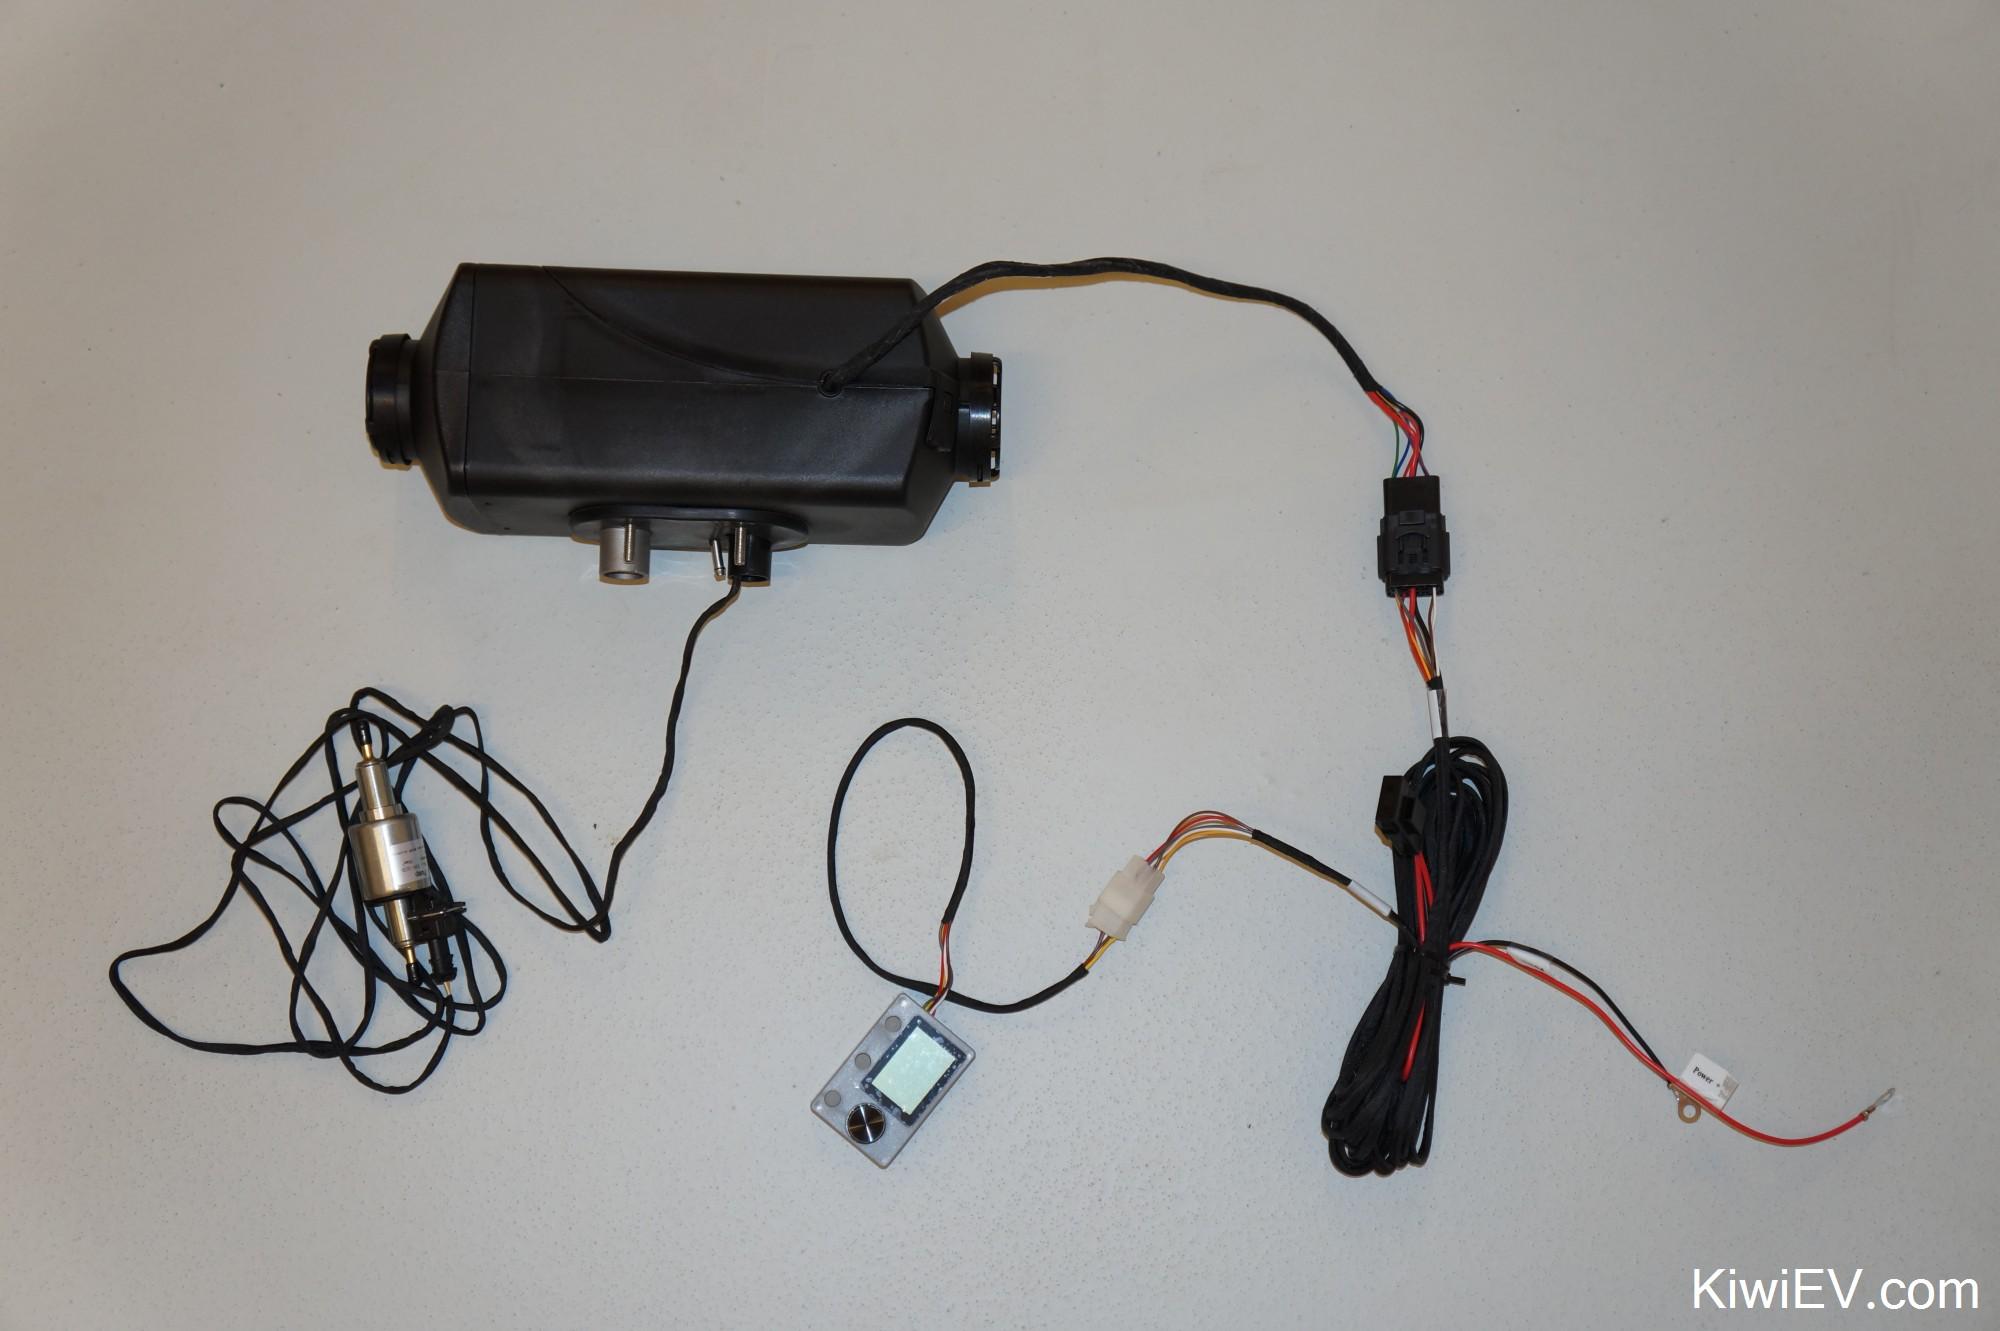 hight resolution of diesel parking heater close up aliexpress chinese clone of eberspacher parking heater